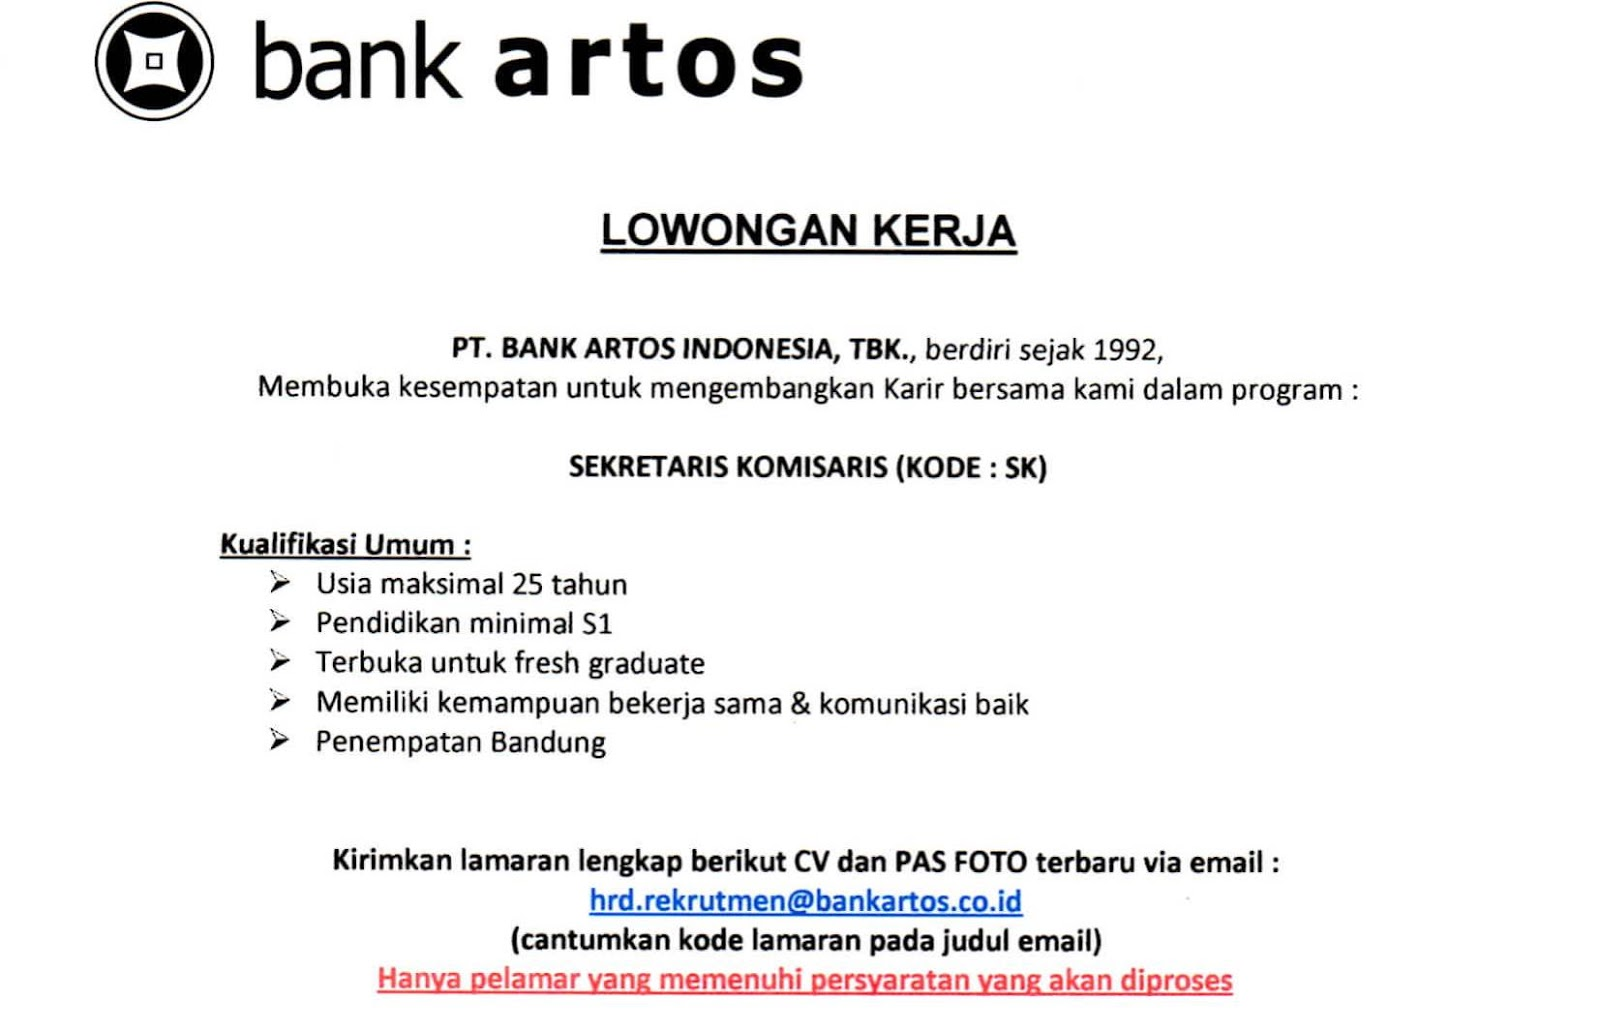 Lowongan Kerja Bank Artos Indonesia